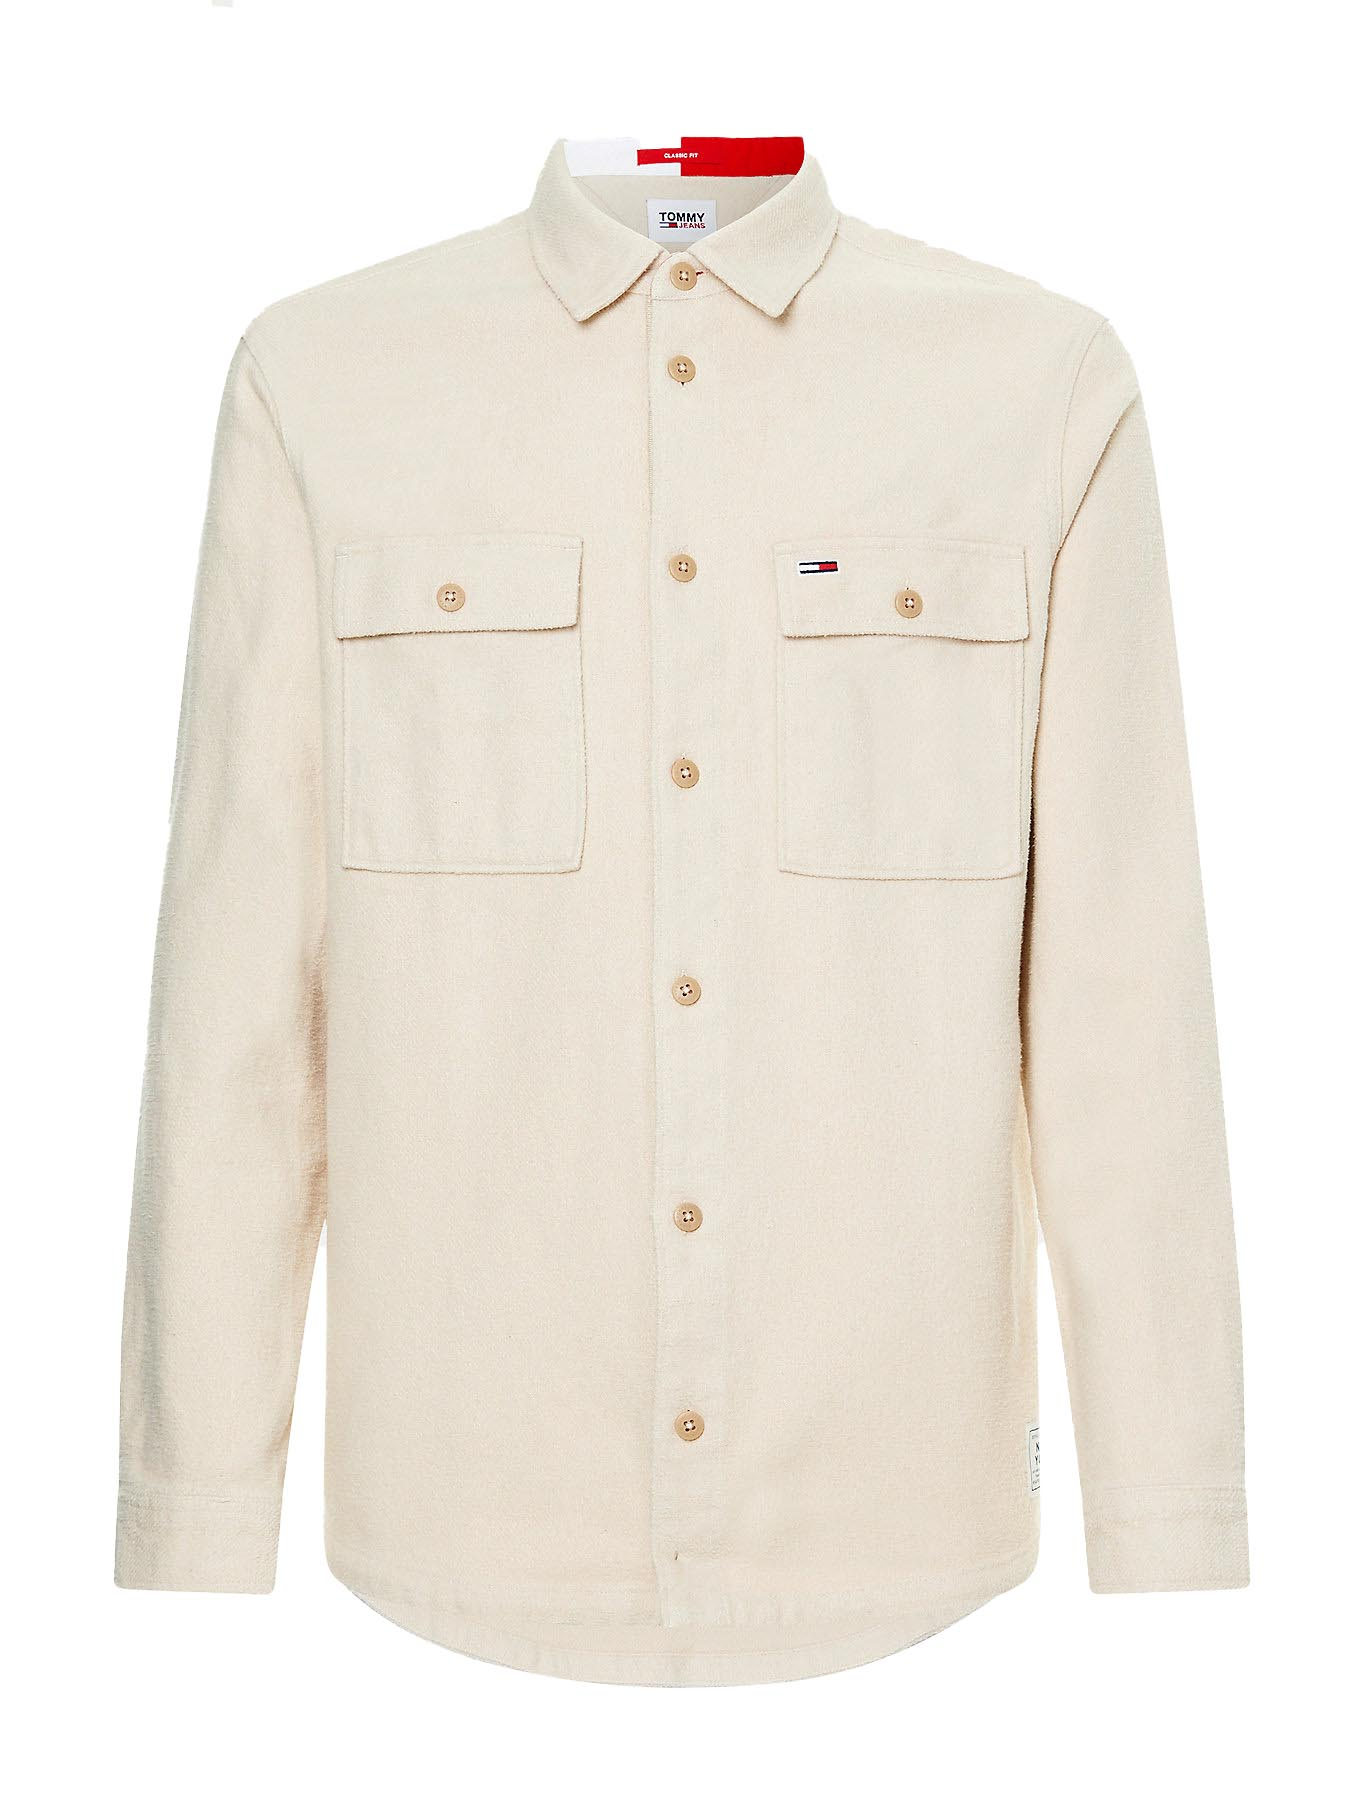 Soft Overshirt